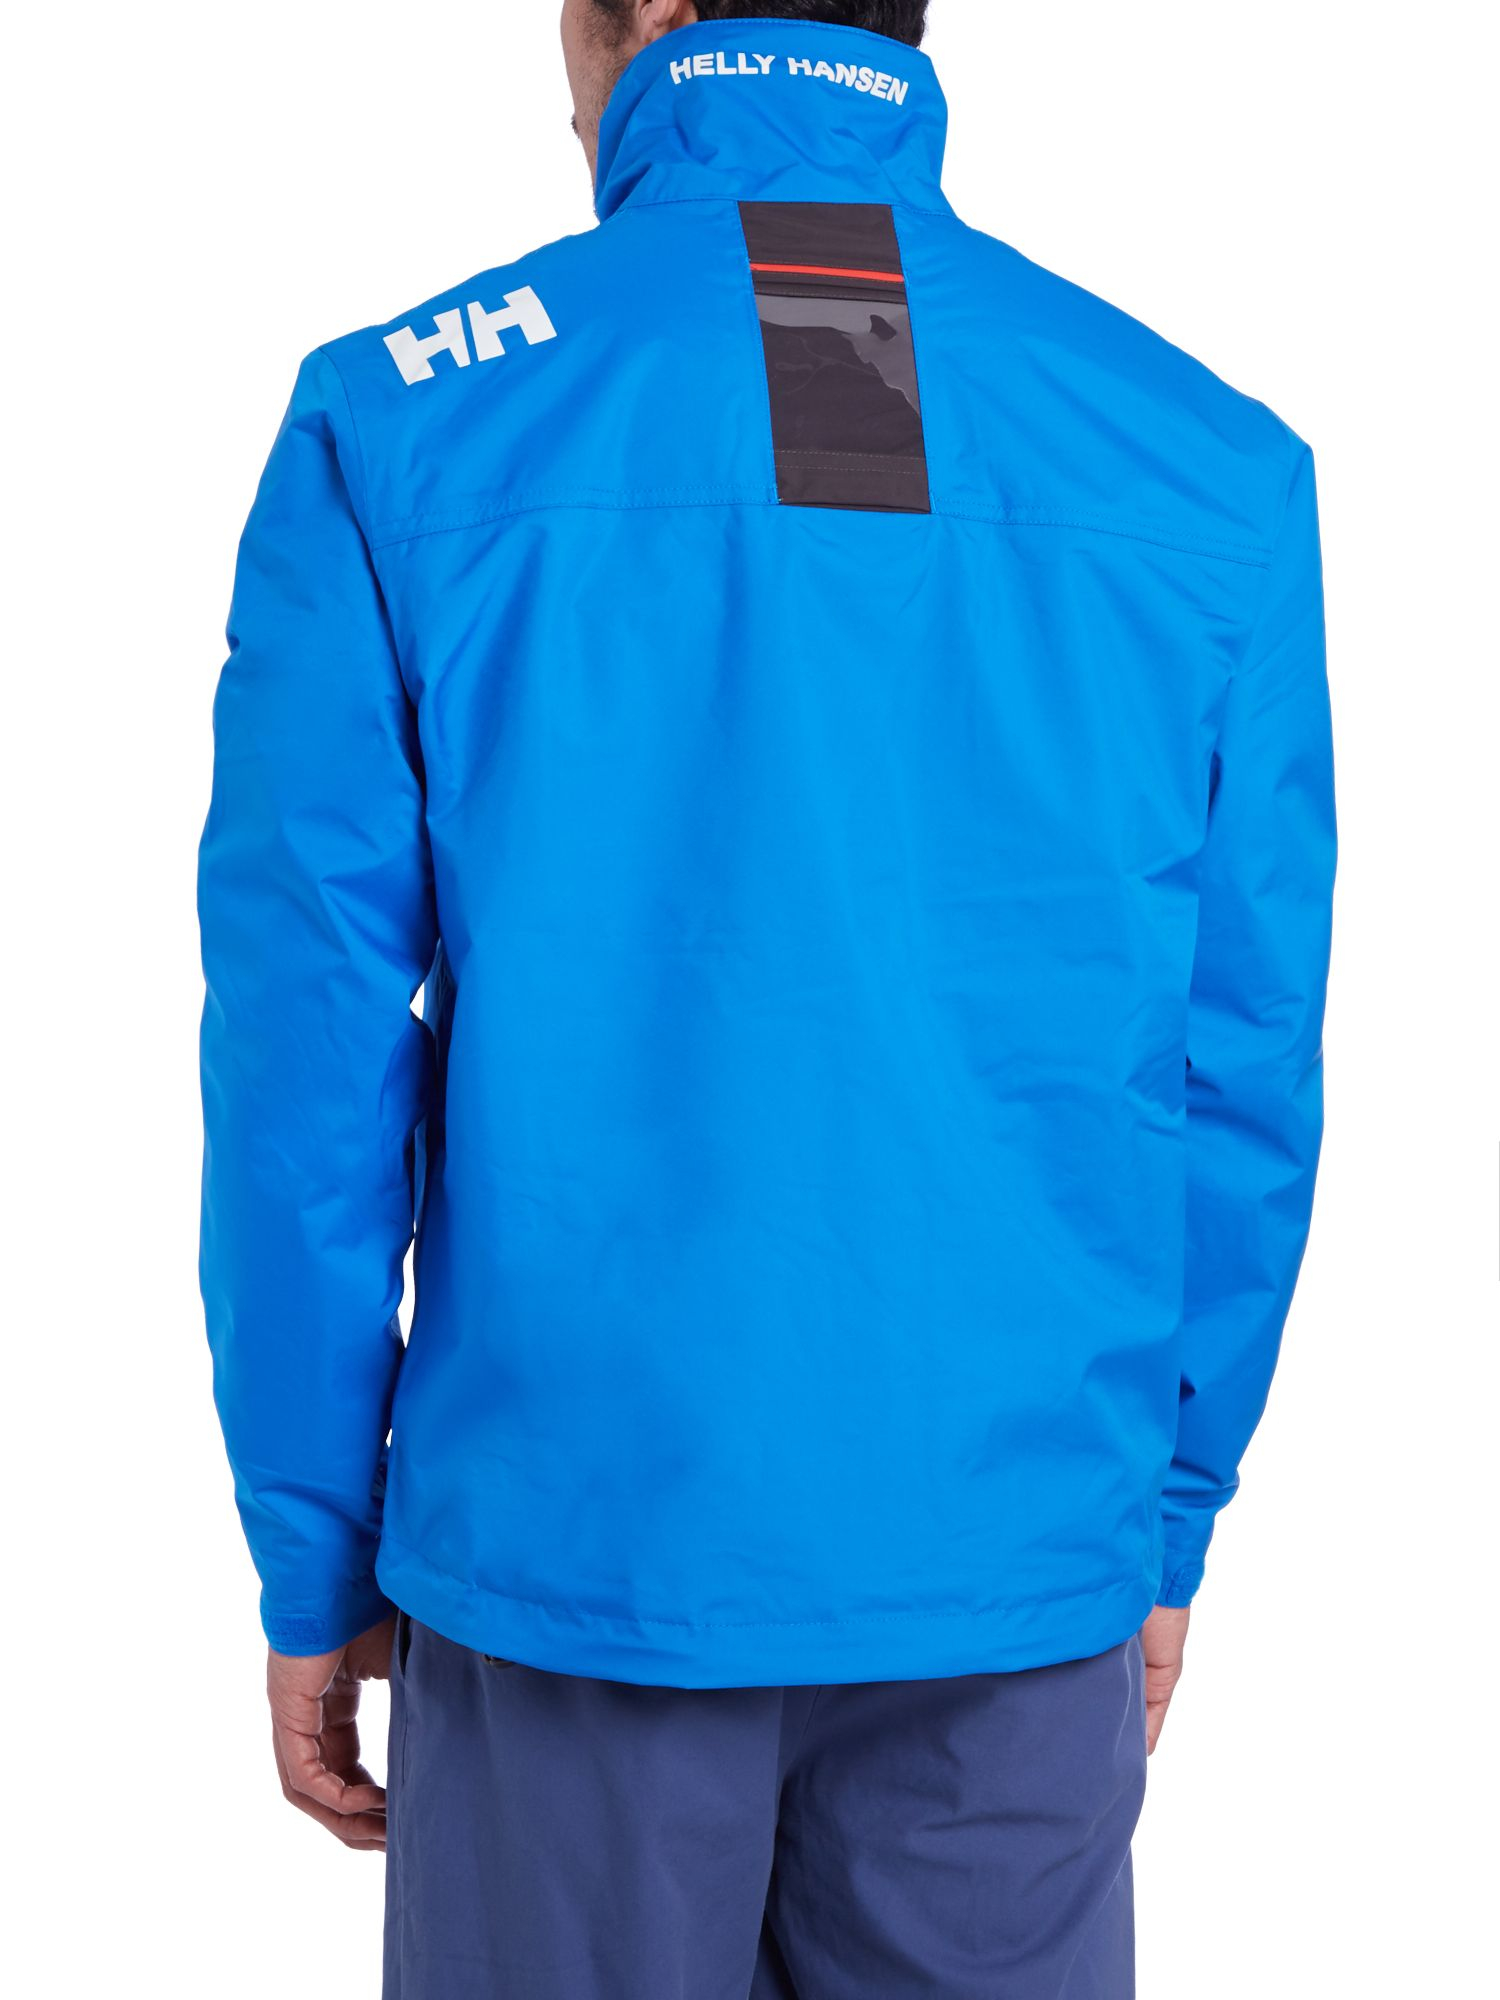 helly hansen crew midlayer jacket in blue for men lyst. Black Bedroom Furniture Sets. Home Design Ideas